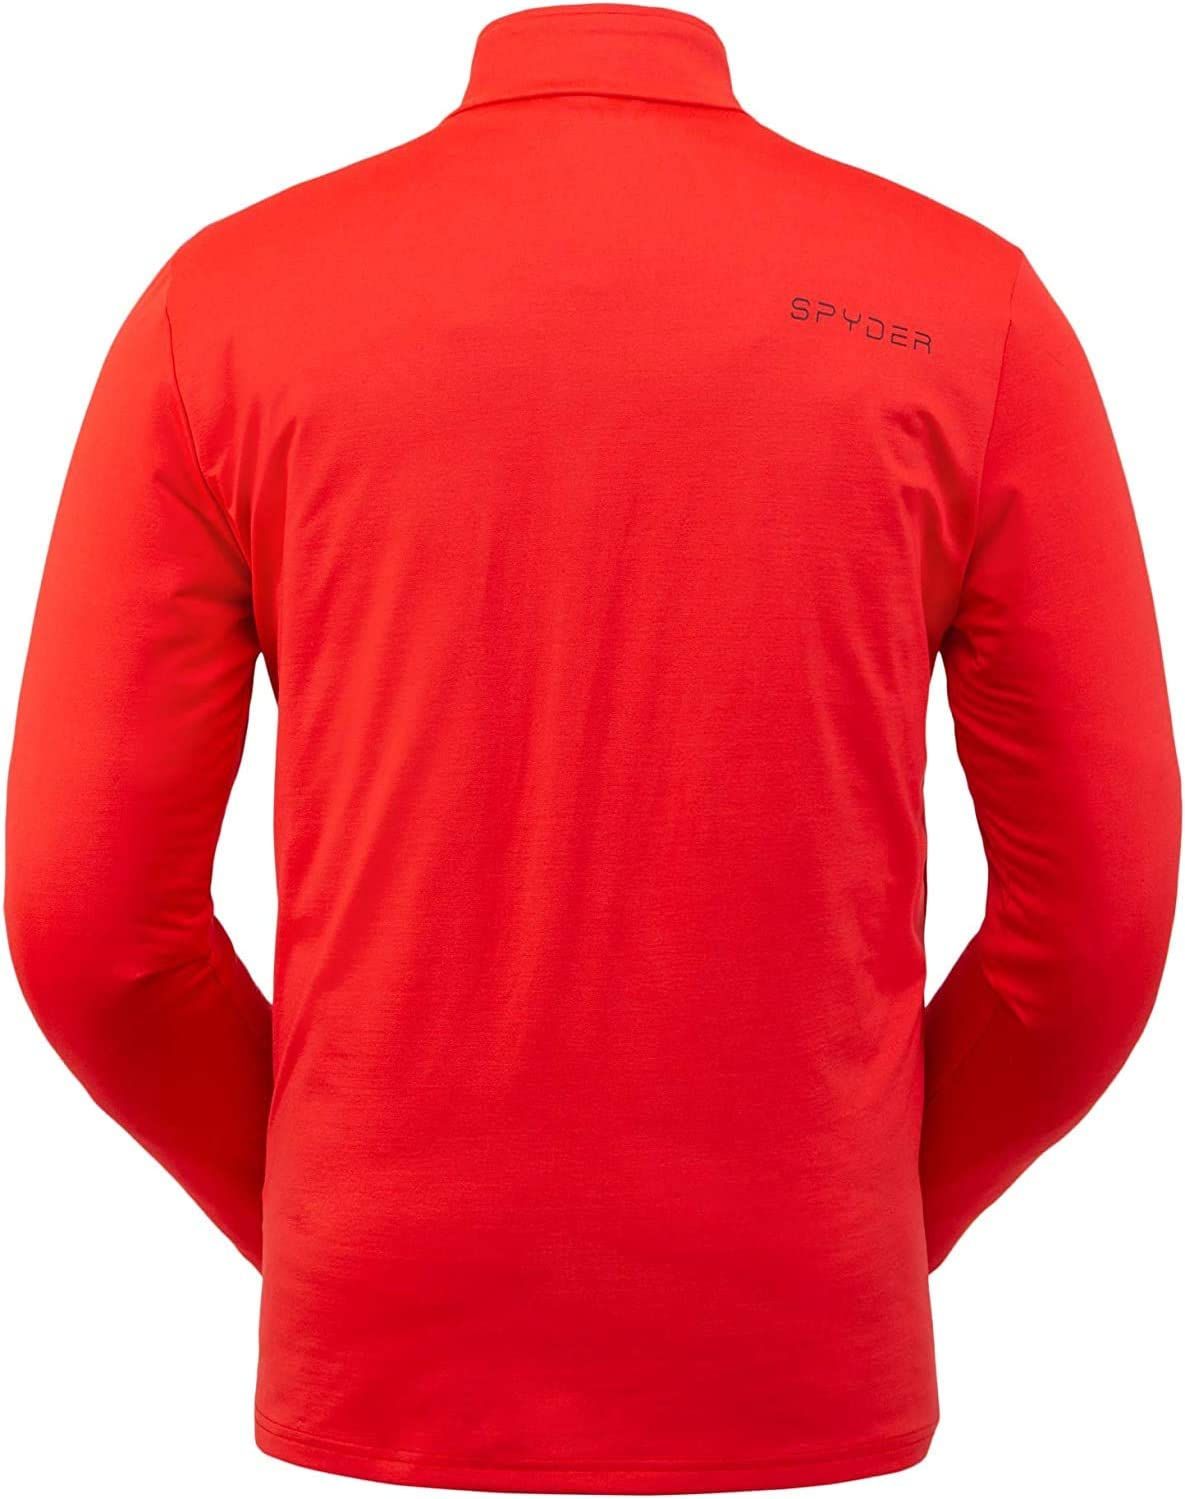 Spyder Prospect S 191266 Mens Mens Thermal T-Shirt Mojito